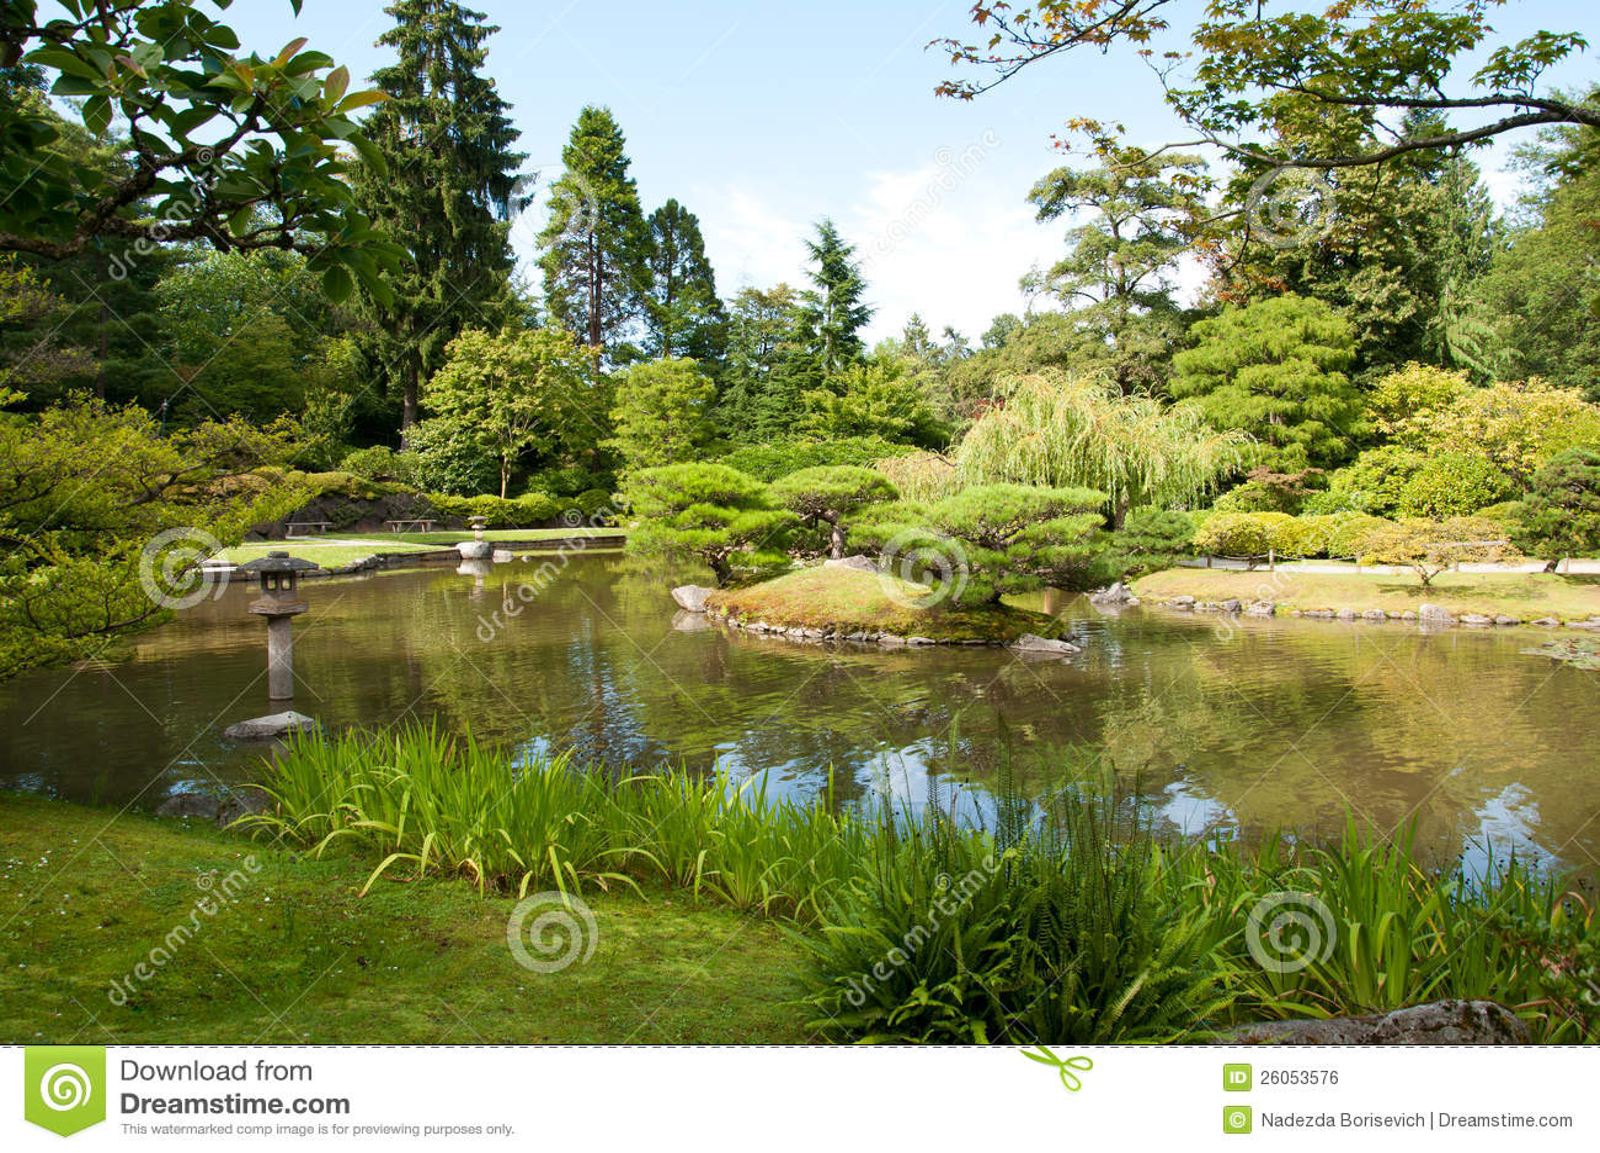 Japanse tuin vijver lantaarn royalty vrije stock afbeelding afbeelding 26053576 - Foto van tuin vijver ...